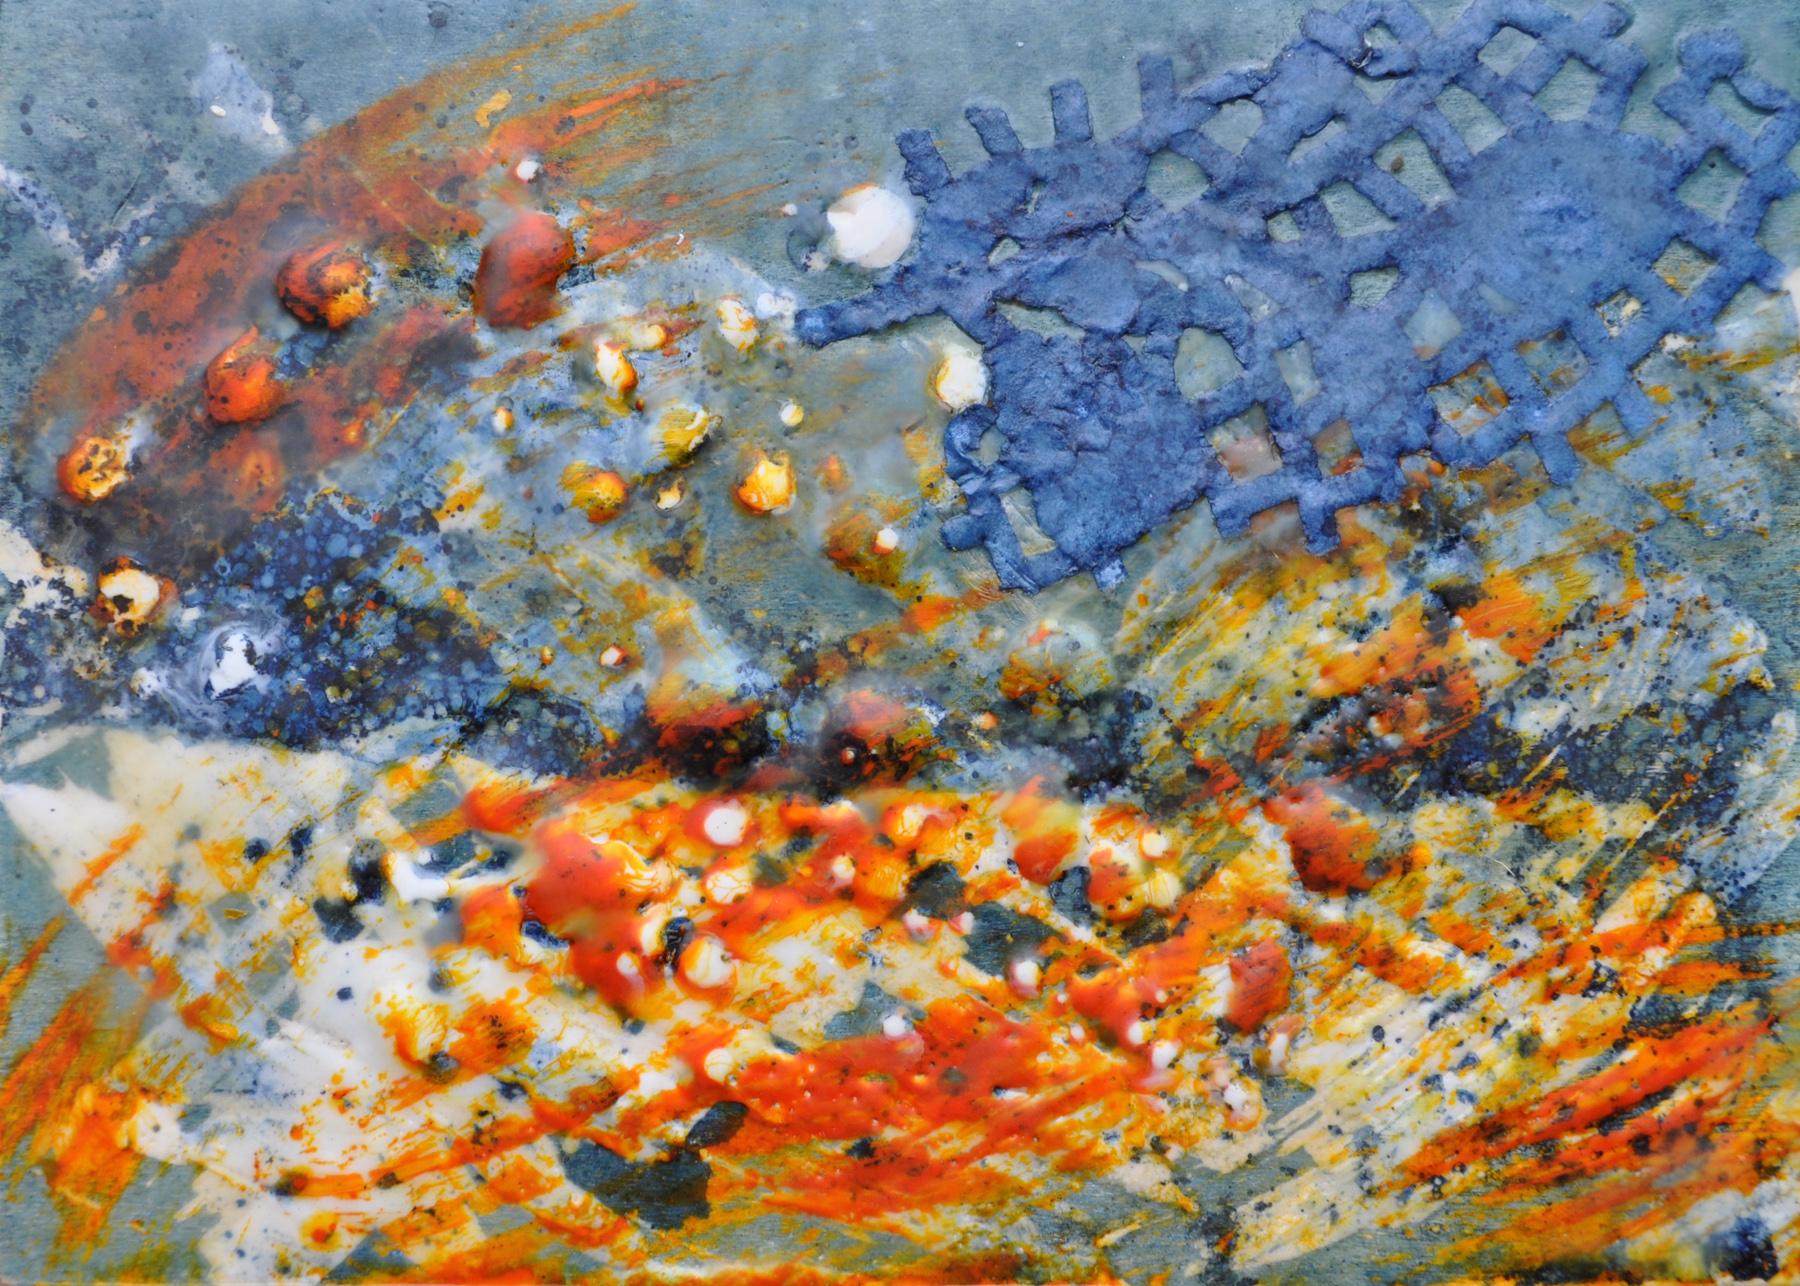 "La Alborada #1 (The Dawn #1) encaustic, indigo-dyed paper, 7x5"""